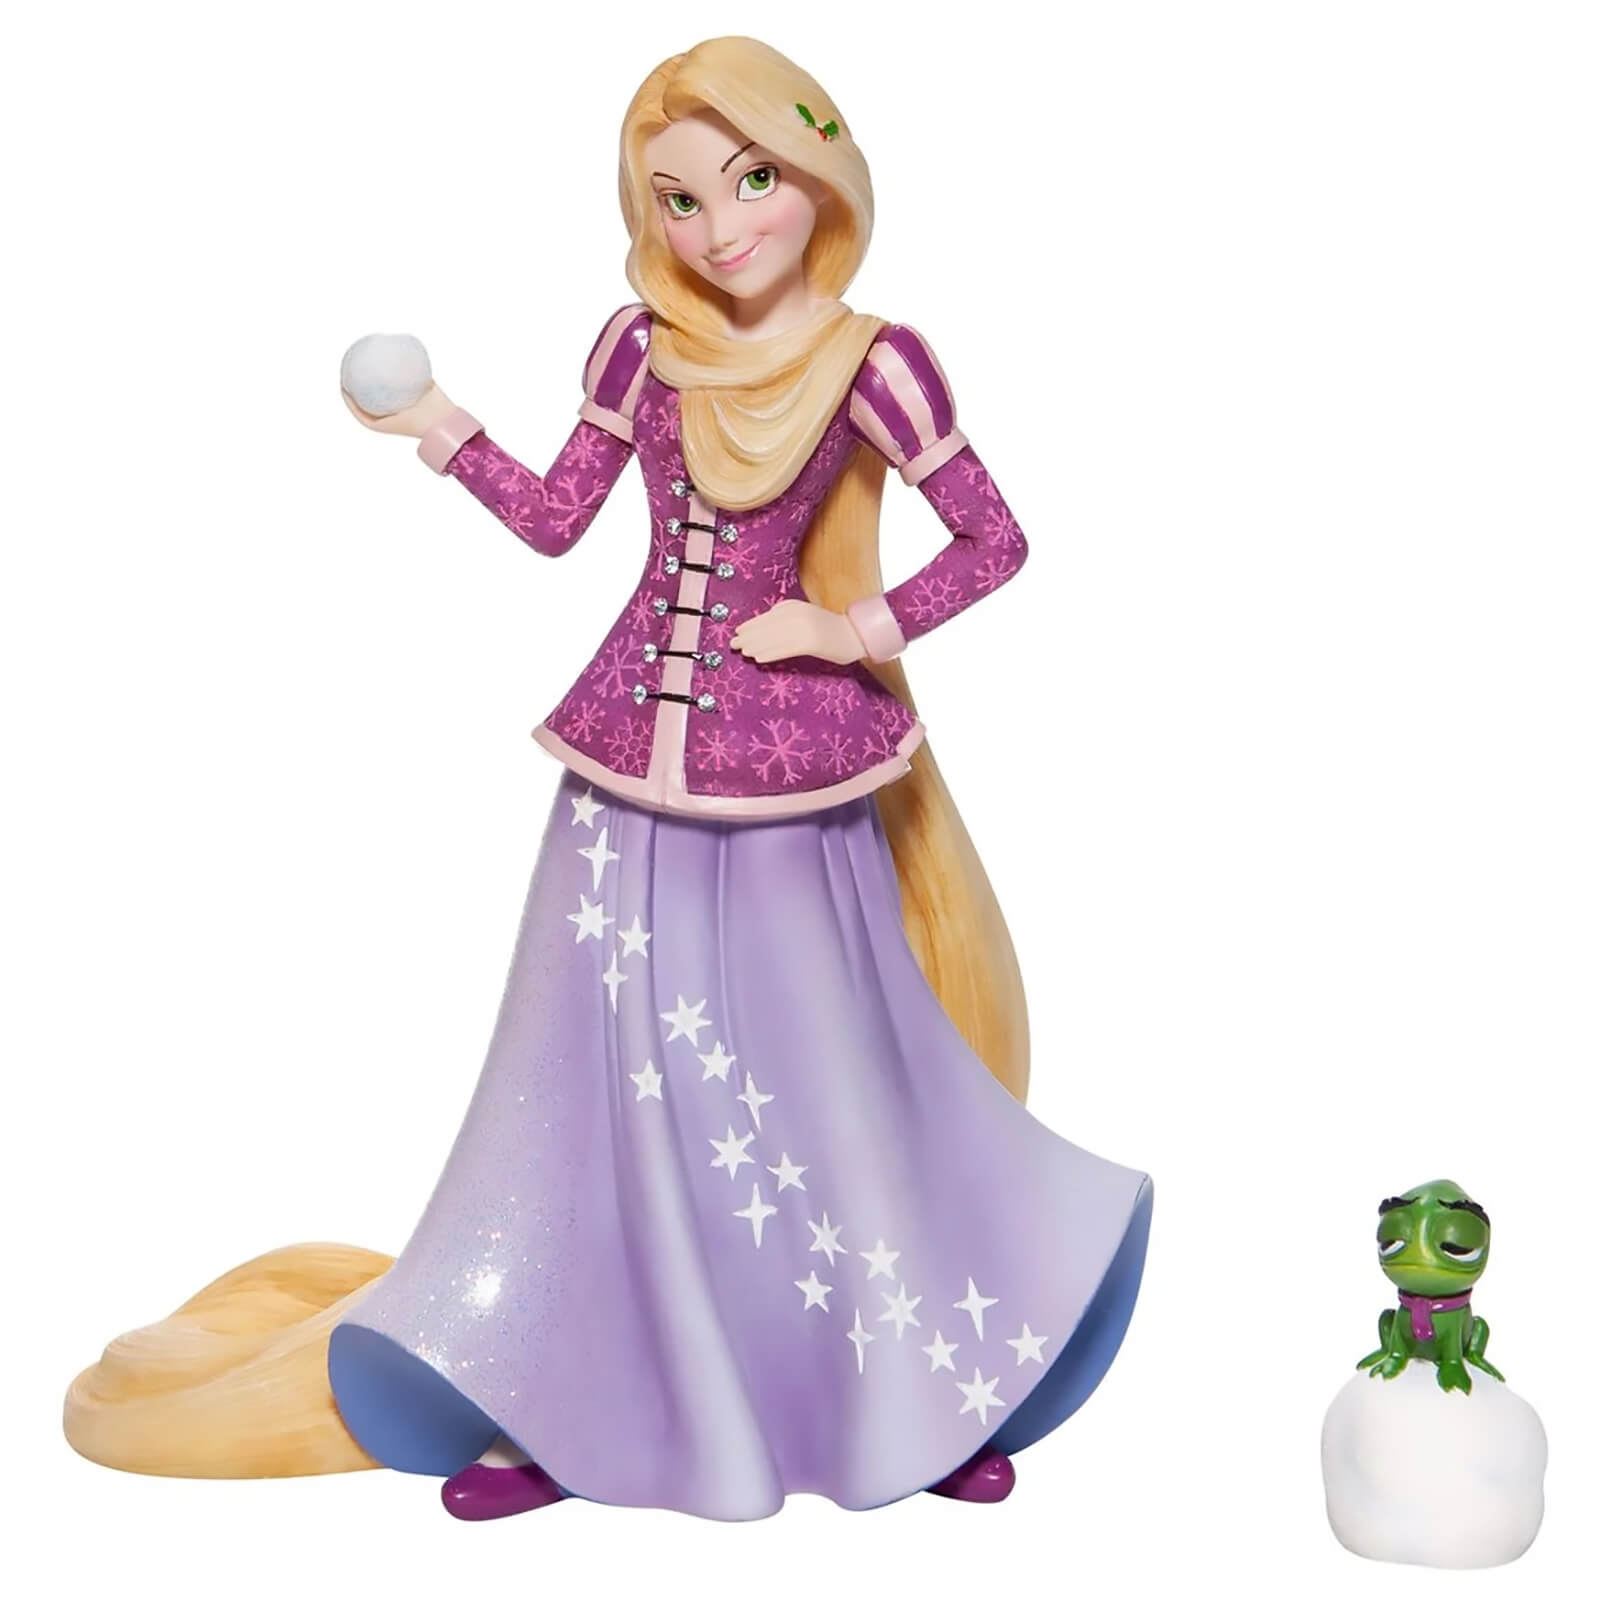 Image of Disney Showcase Collection Christmas Rapunzel Figurine 19cm